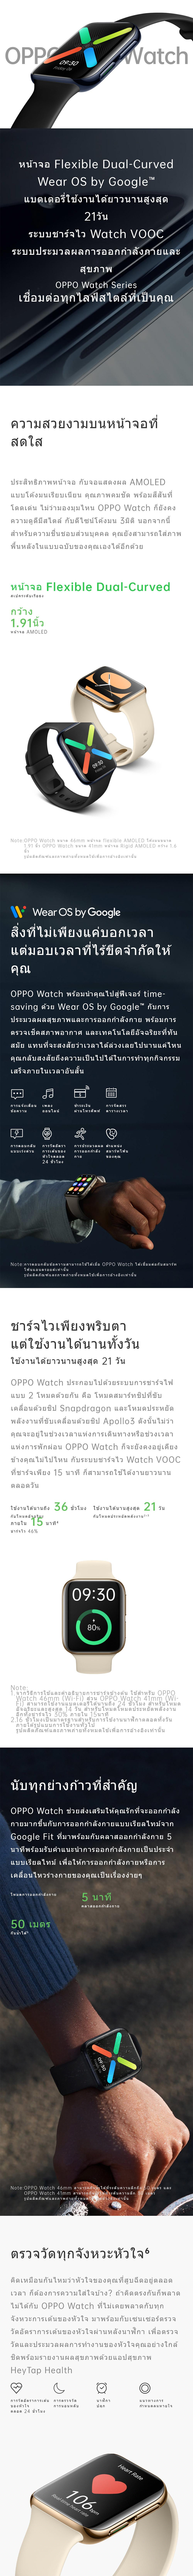 oppo-watch-longpage-v2.jpg